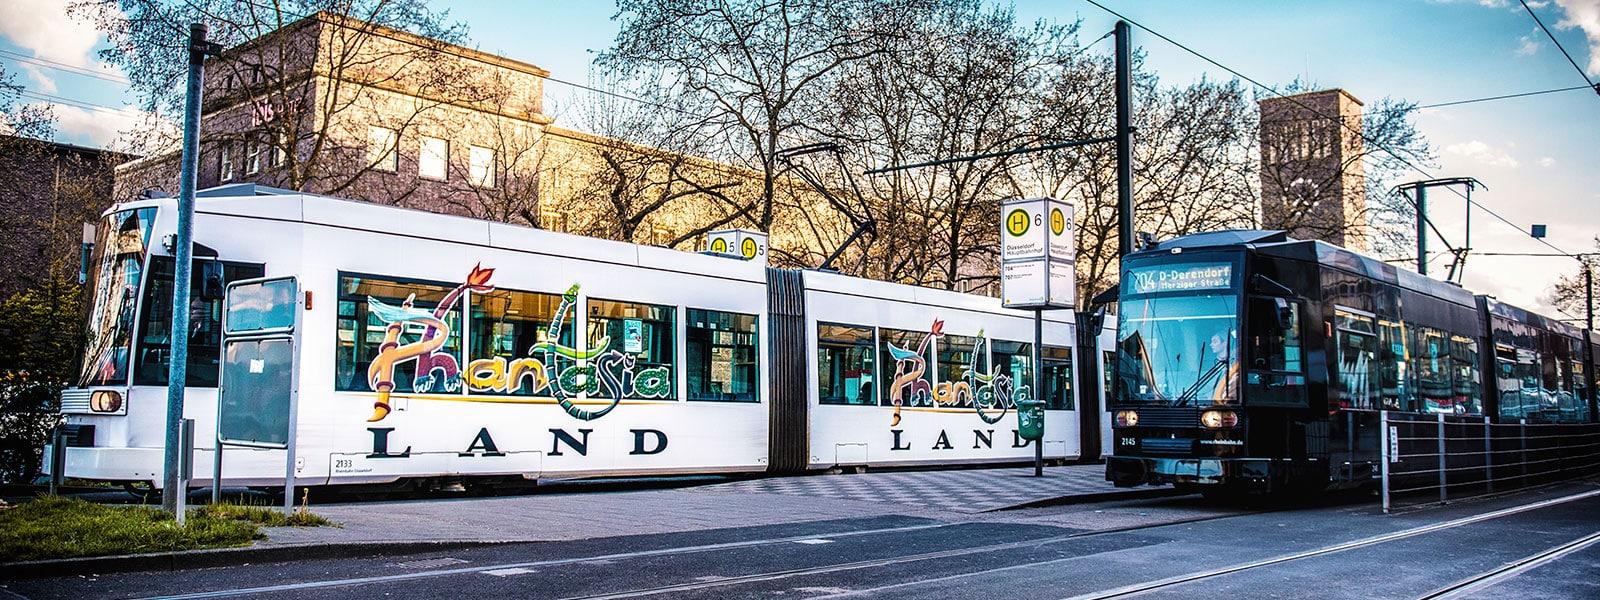 Duesseldorf-Verkehrsmittelwerbung-Bahn-Werbung